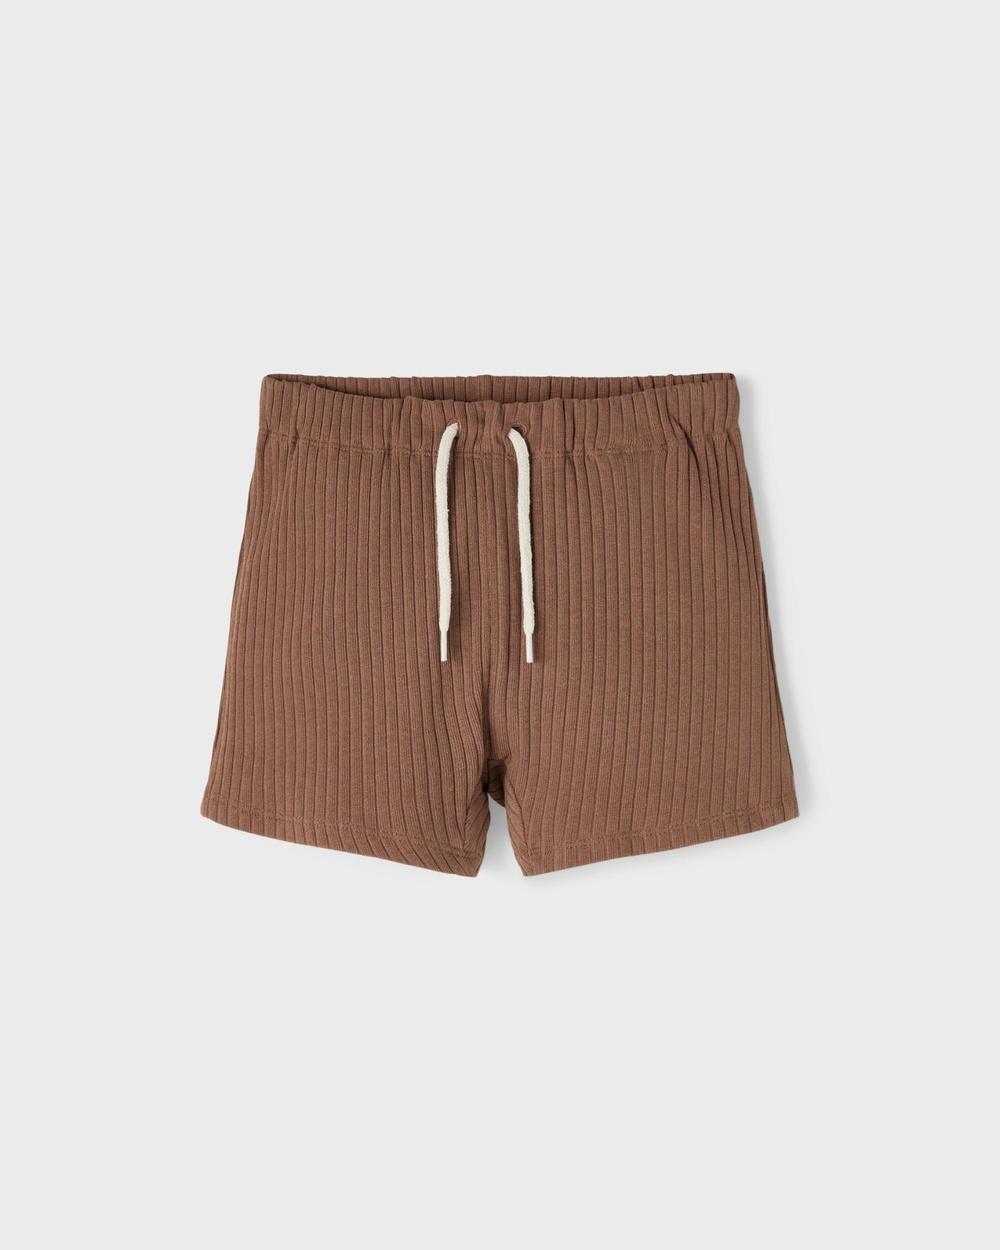 Lil' Atelier Sixten Loose Shorts Kids Brown